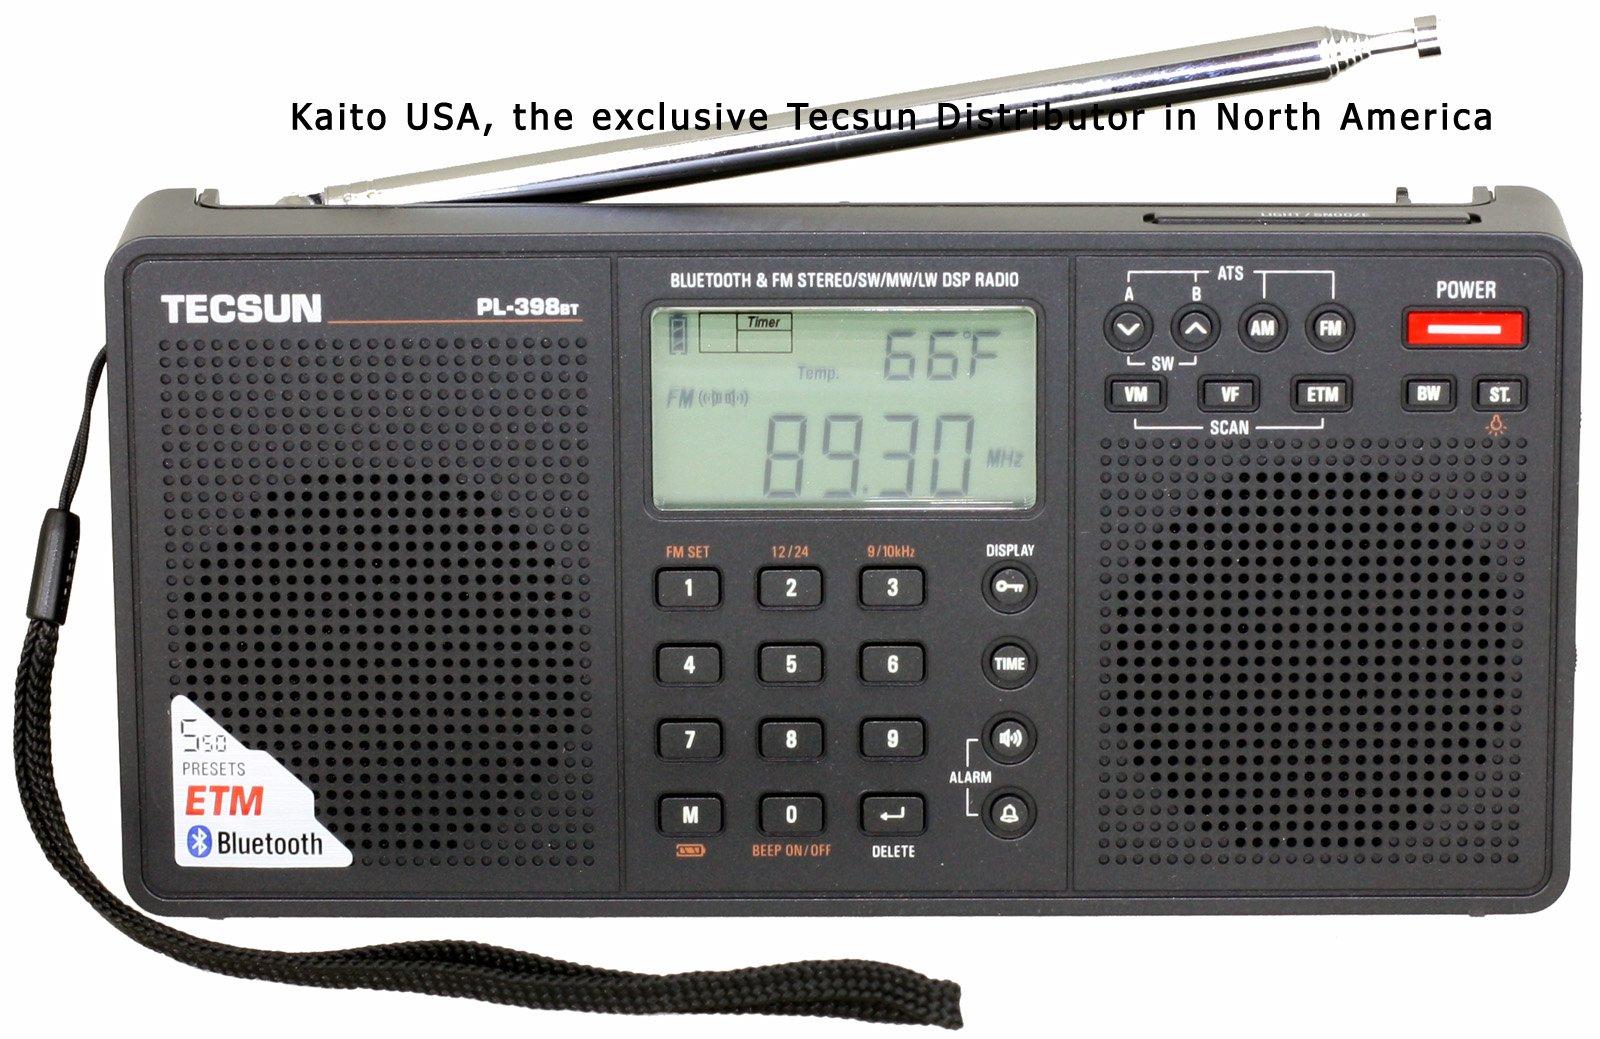 Tecsun PL398BT DSP Digital AM/FM/LW Shortwave Radio with Dual Speakers & Bluetooth, Black